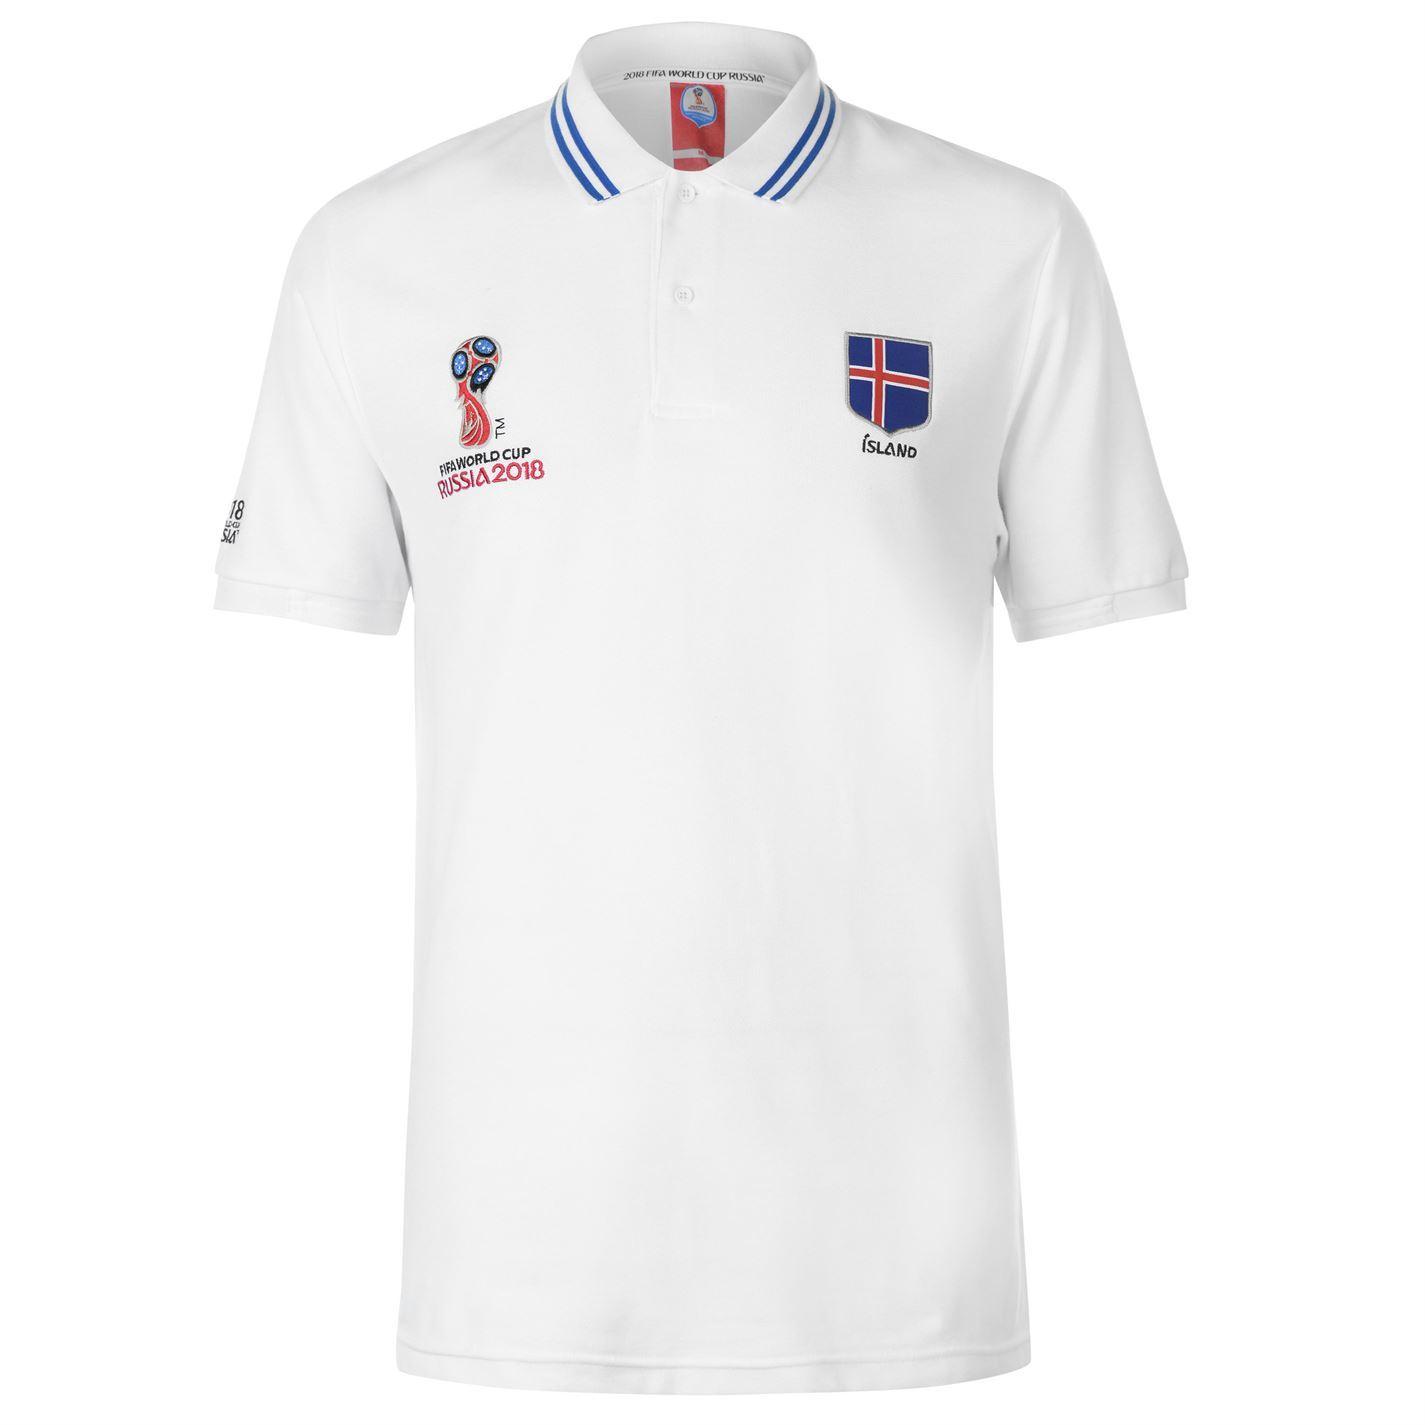 5d4699c35 ... FIFA World Cup 2018 Iceland Polo Shirt Mens White Football Soccer Top T- Shirt ...